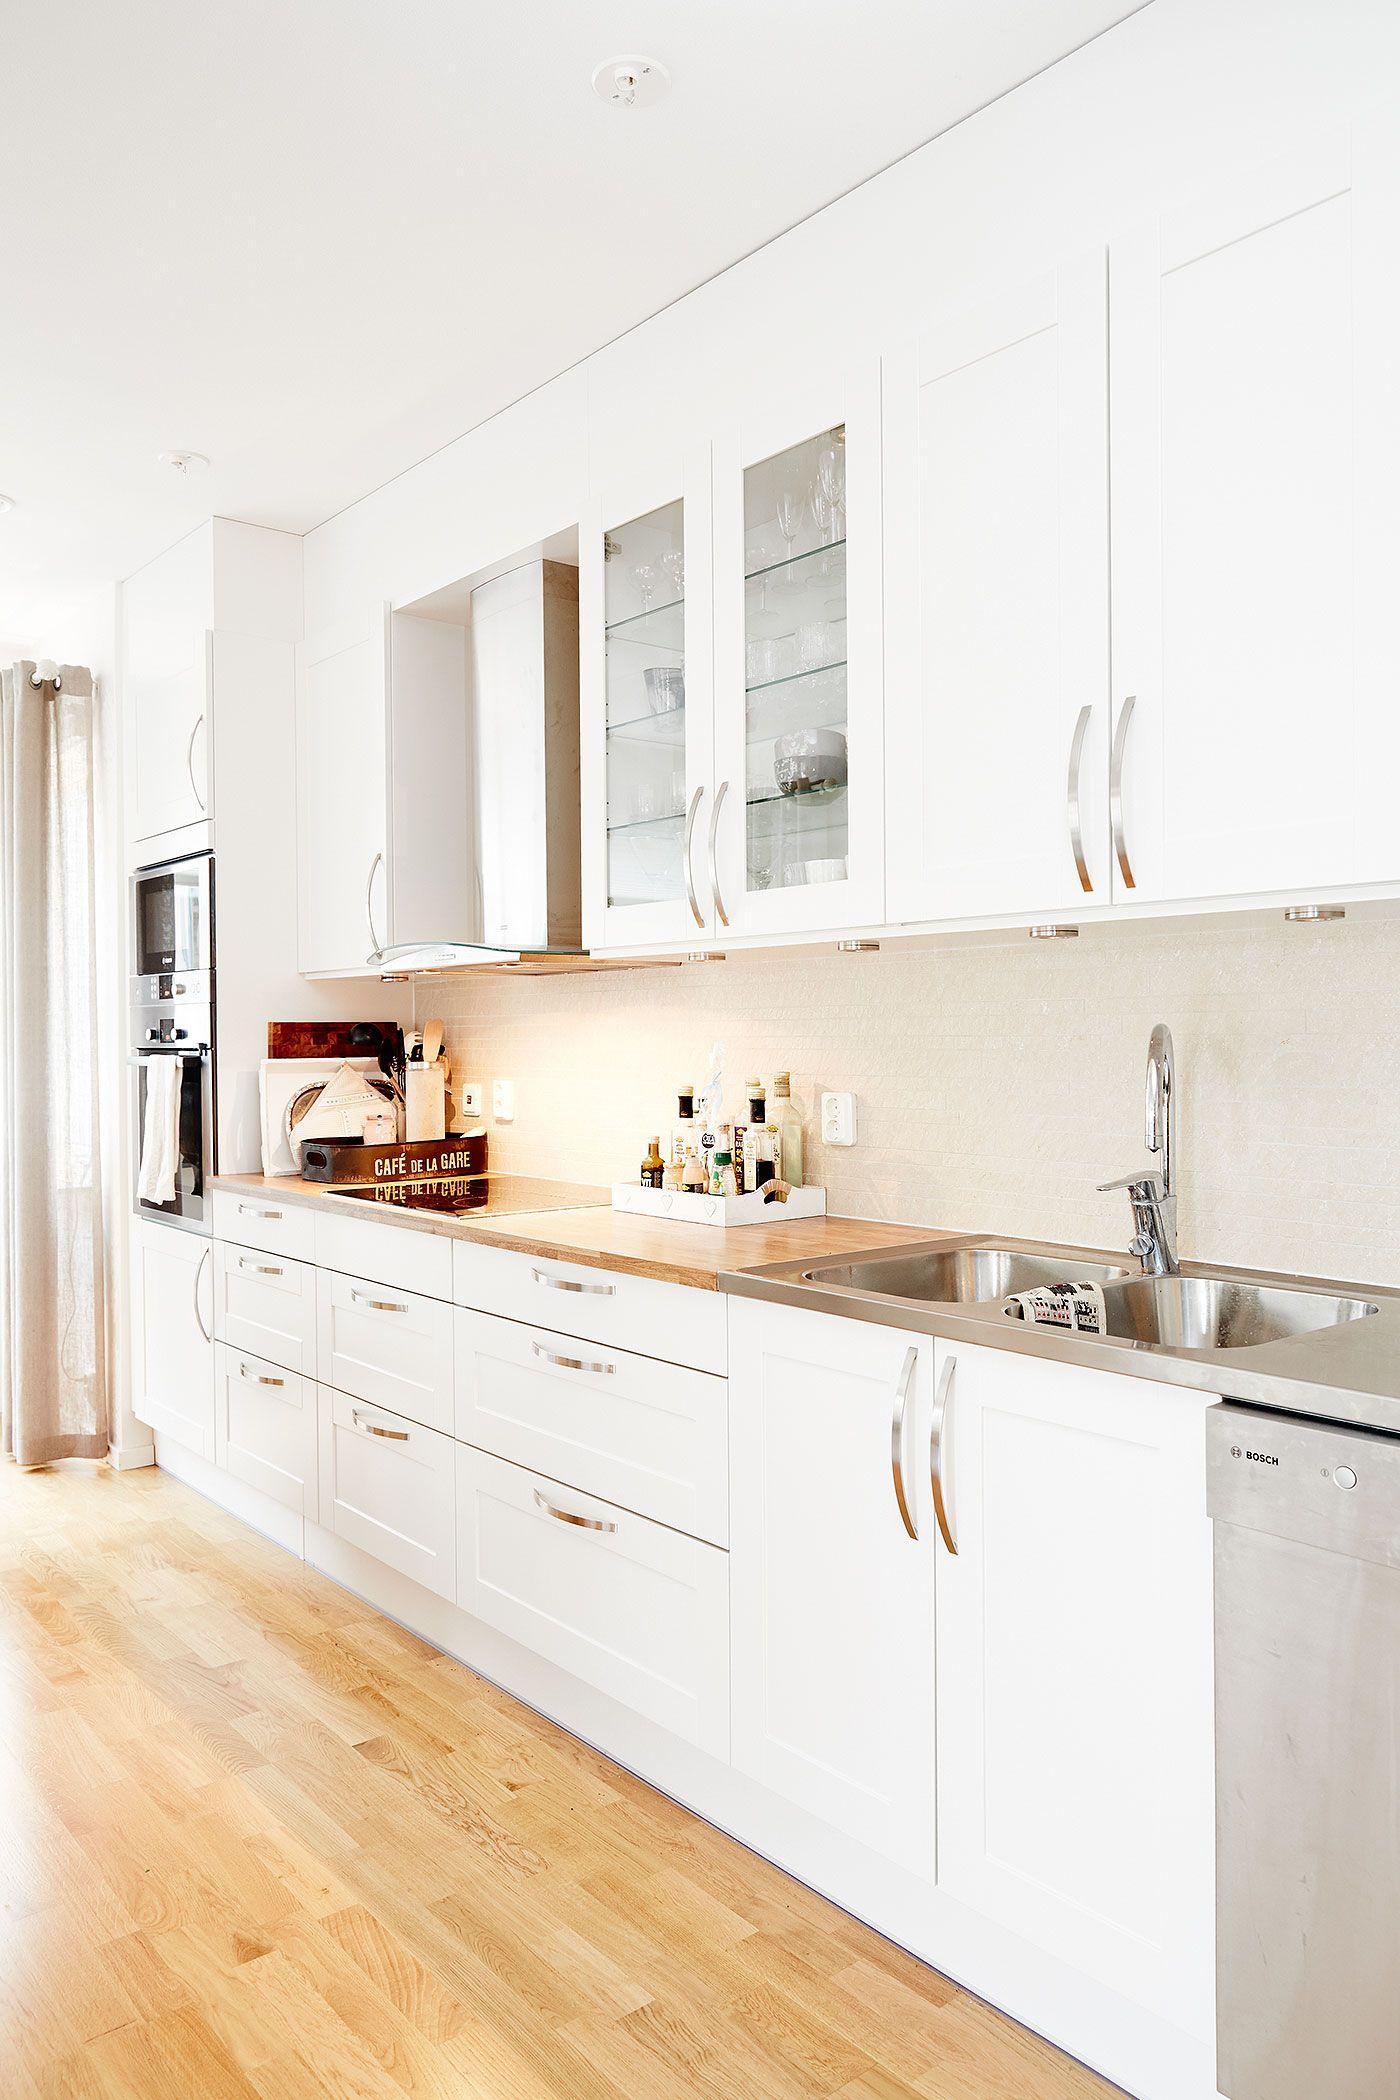 handles kitchen Pinterest Cuisine, Kitchens and Architecture